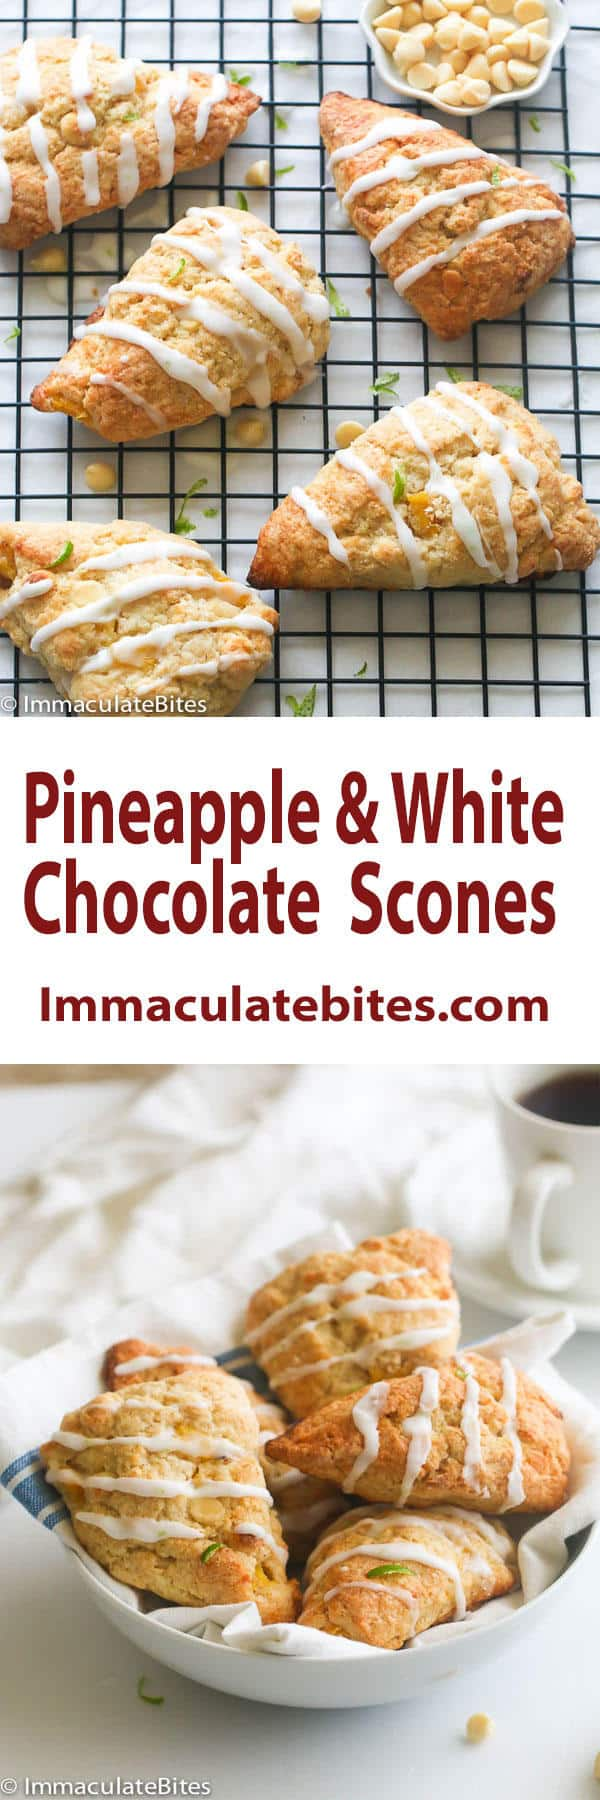 Pineapple White Chocolate Scones